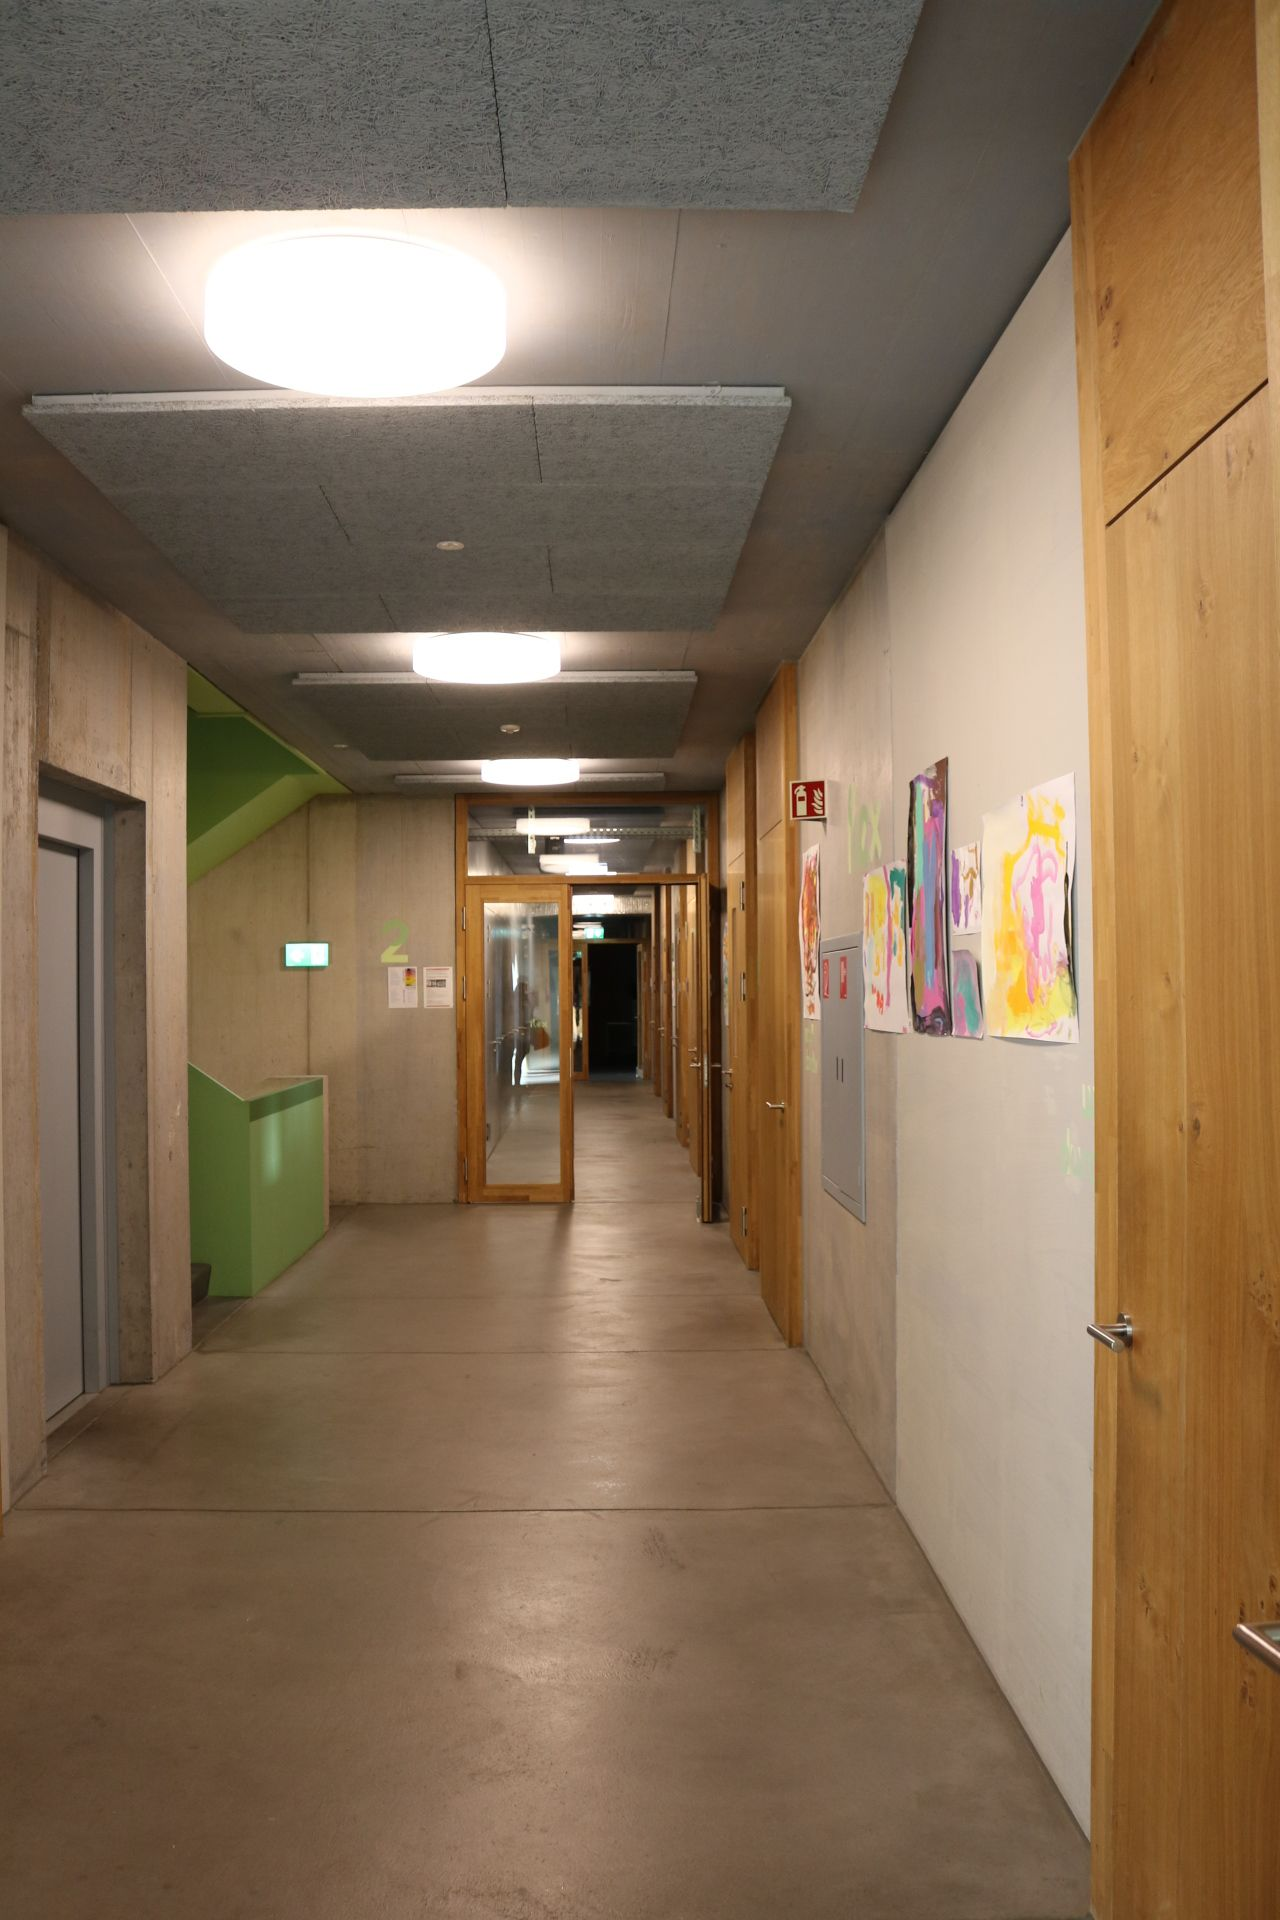 Library And Learning Centre University Of Economics Vienna Zaha Hadid Architects Zaha Hadid Architektur Zaha Hadid Design Lernzentrum